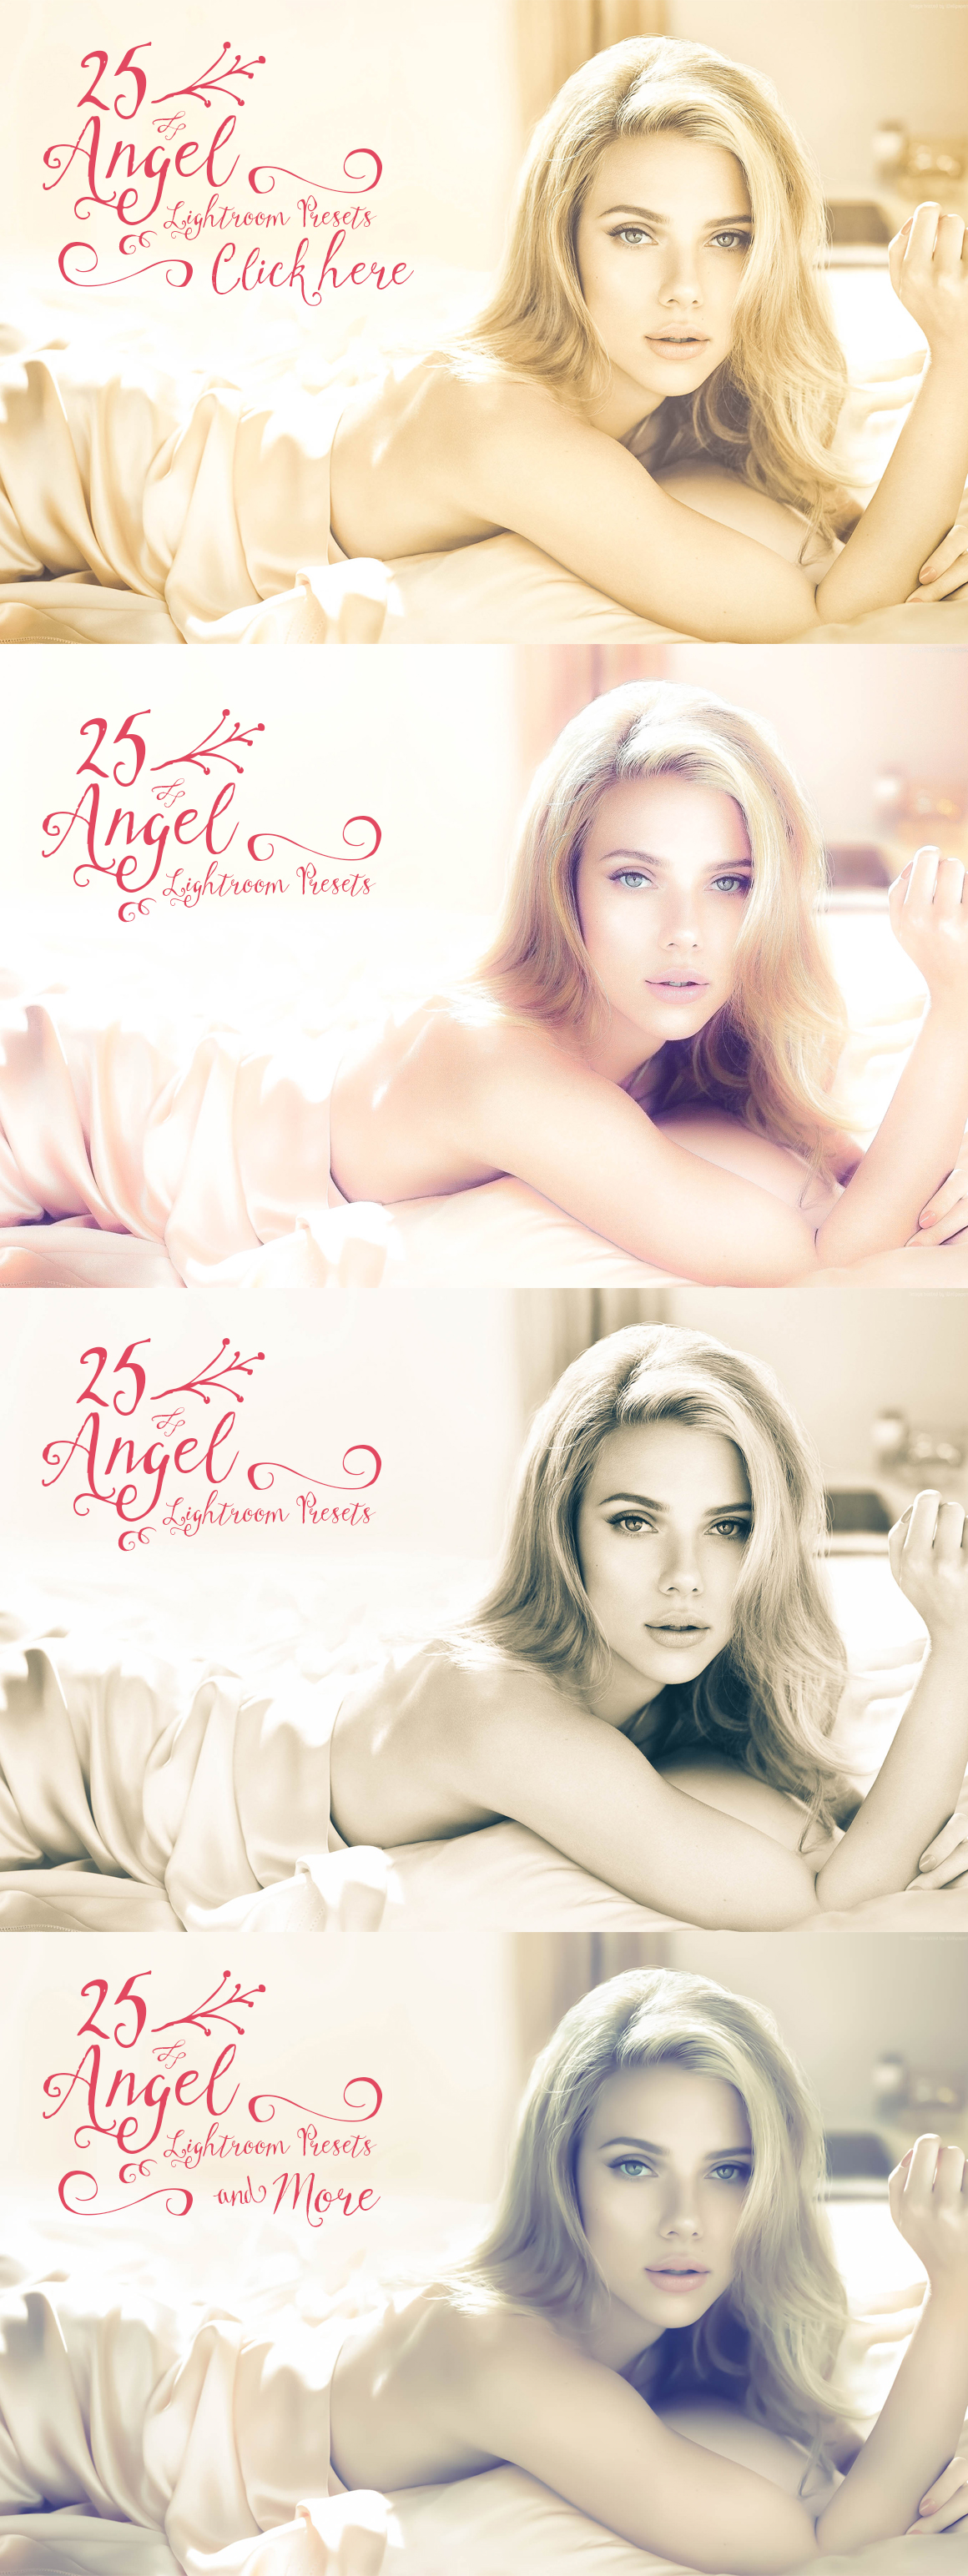 Angel Lightroom Presets example image 5